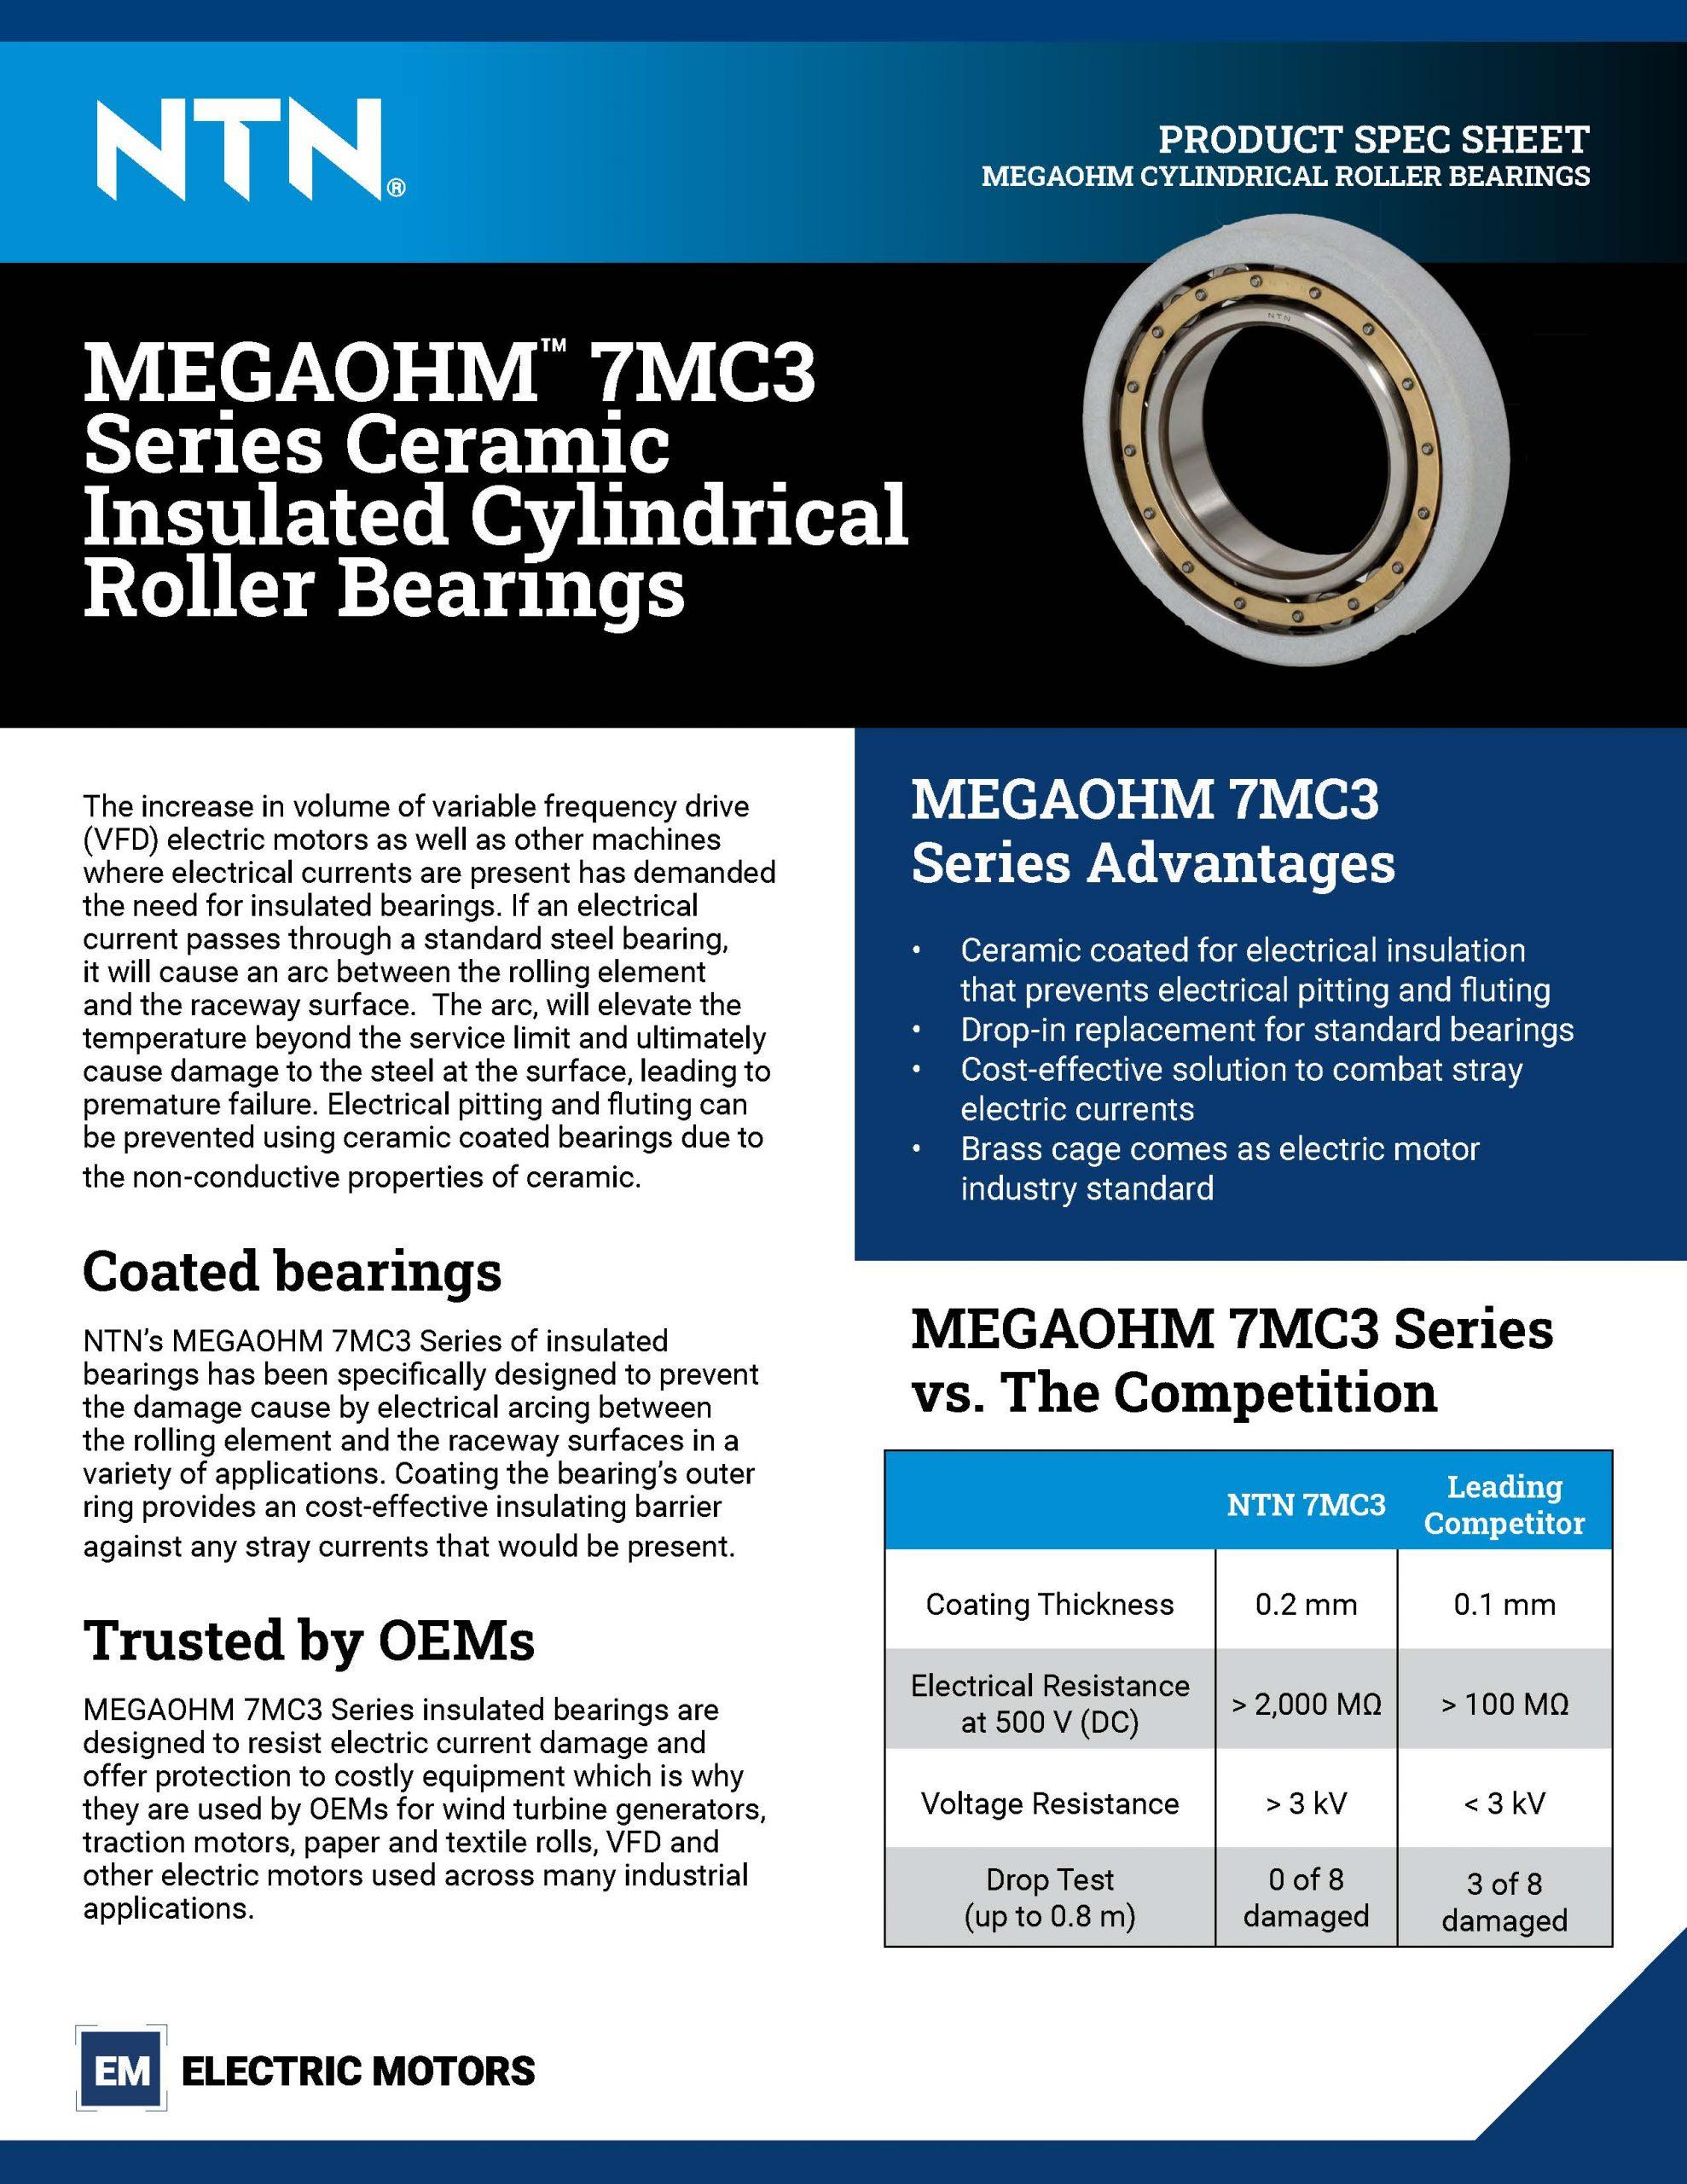 NTN-MEGAOHM CRB-ElectricMotor-SpecSheet-21NTNMOCRB_Page_1